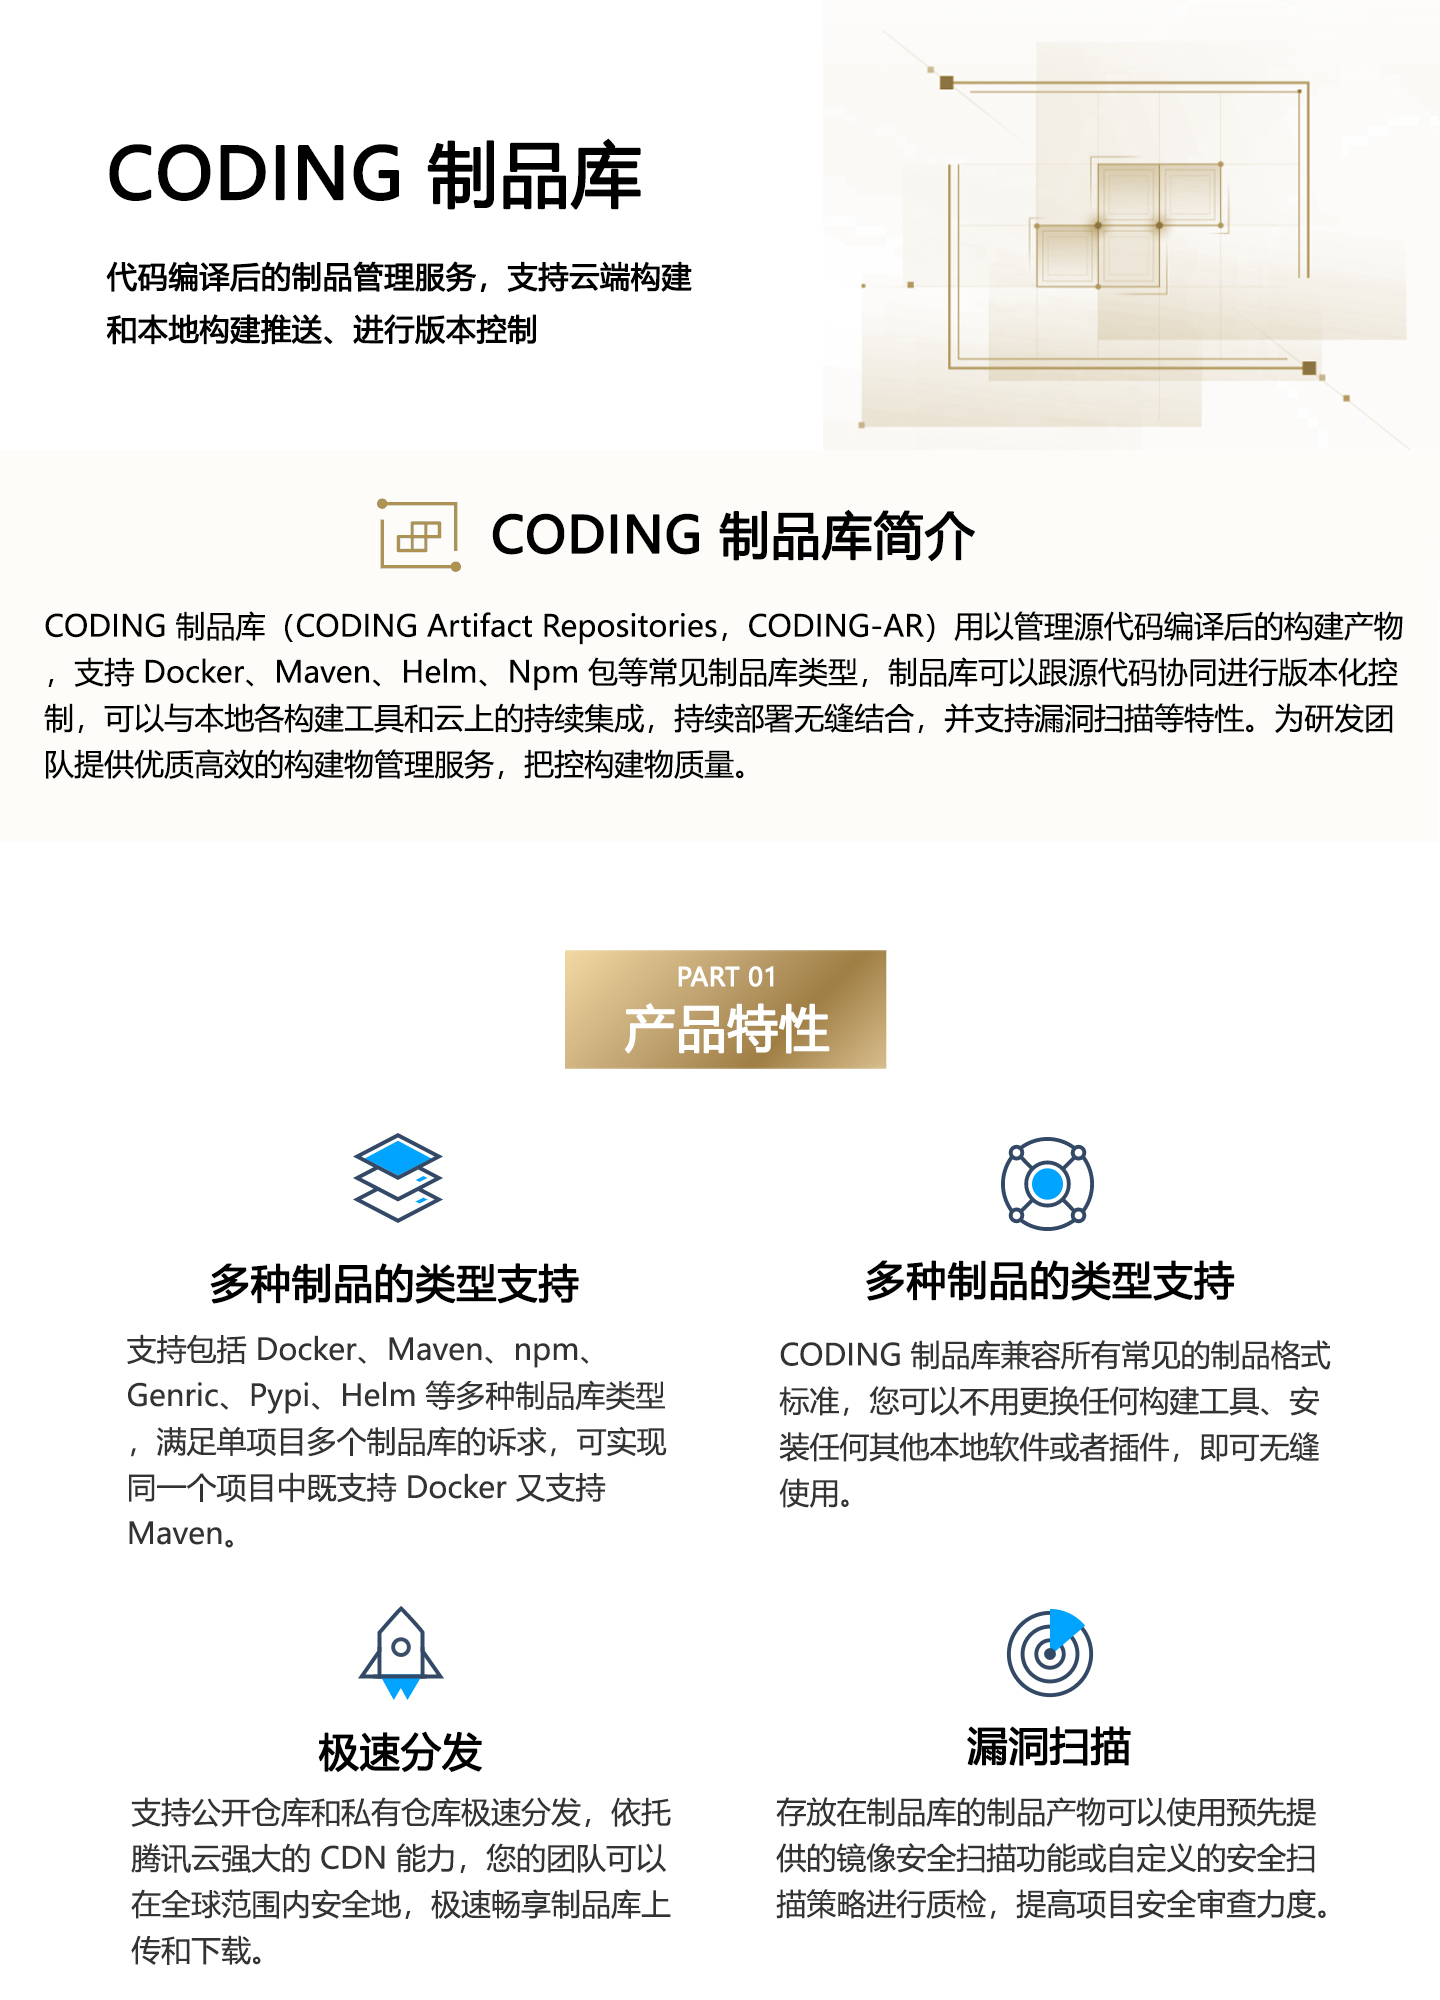 CODING-制品库1440_01.jpg